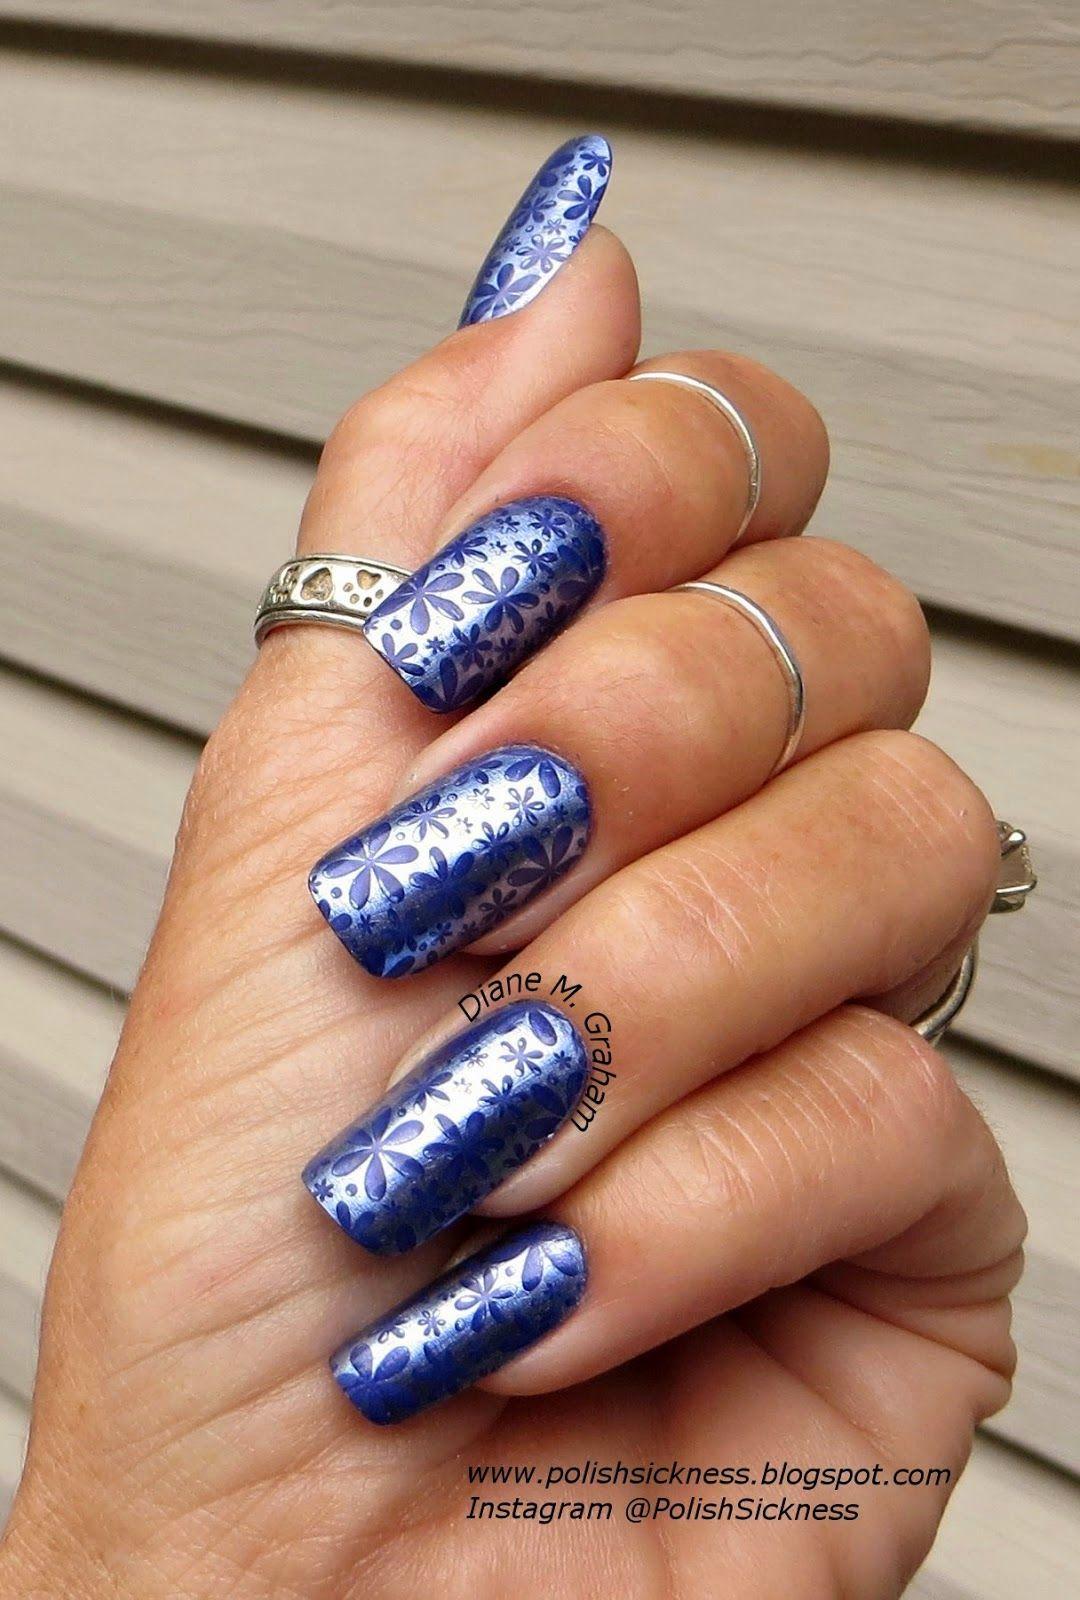 Sally Hansen Color Foil Leaden Lilac, China Glaze Queen B, LeaLac B stamp